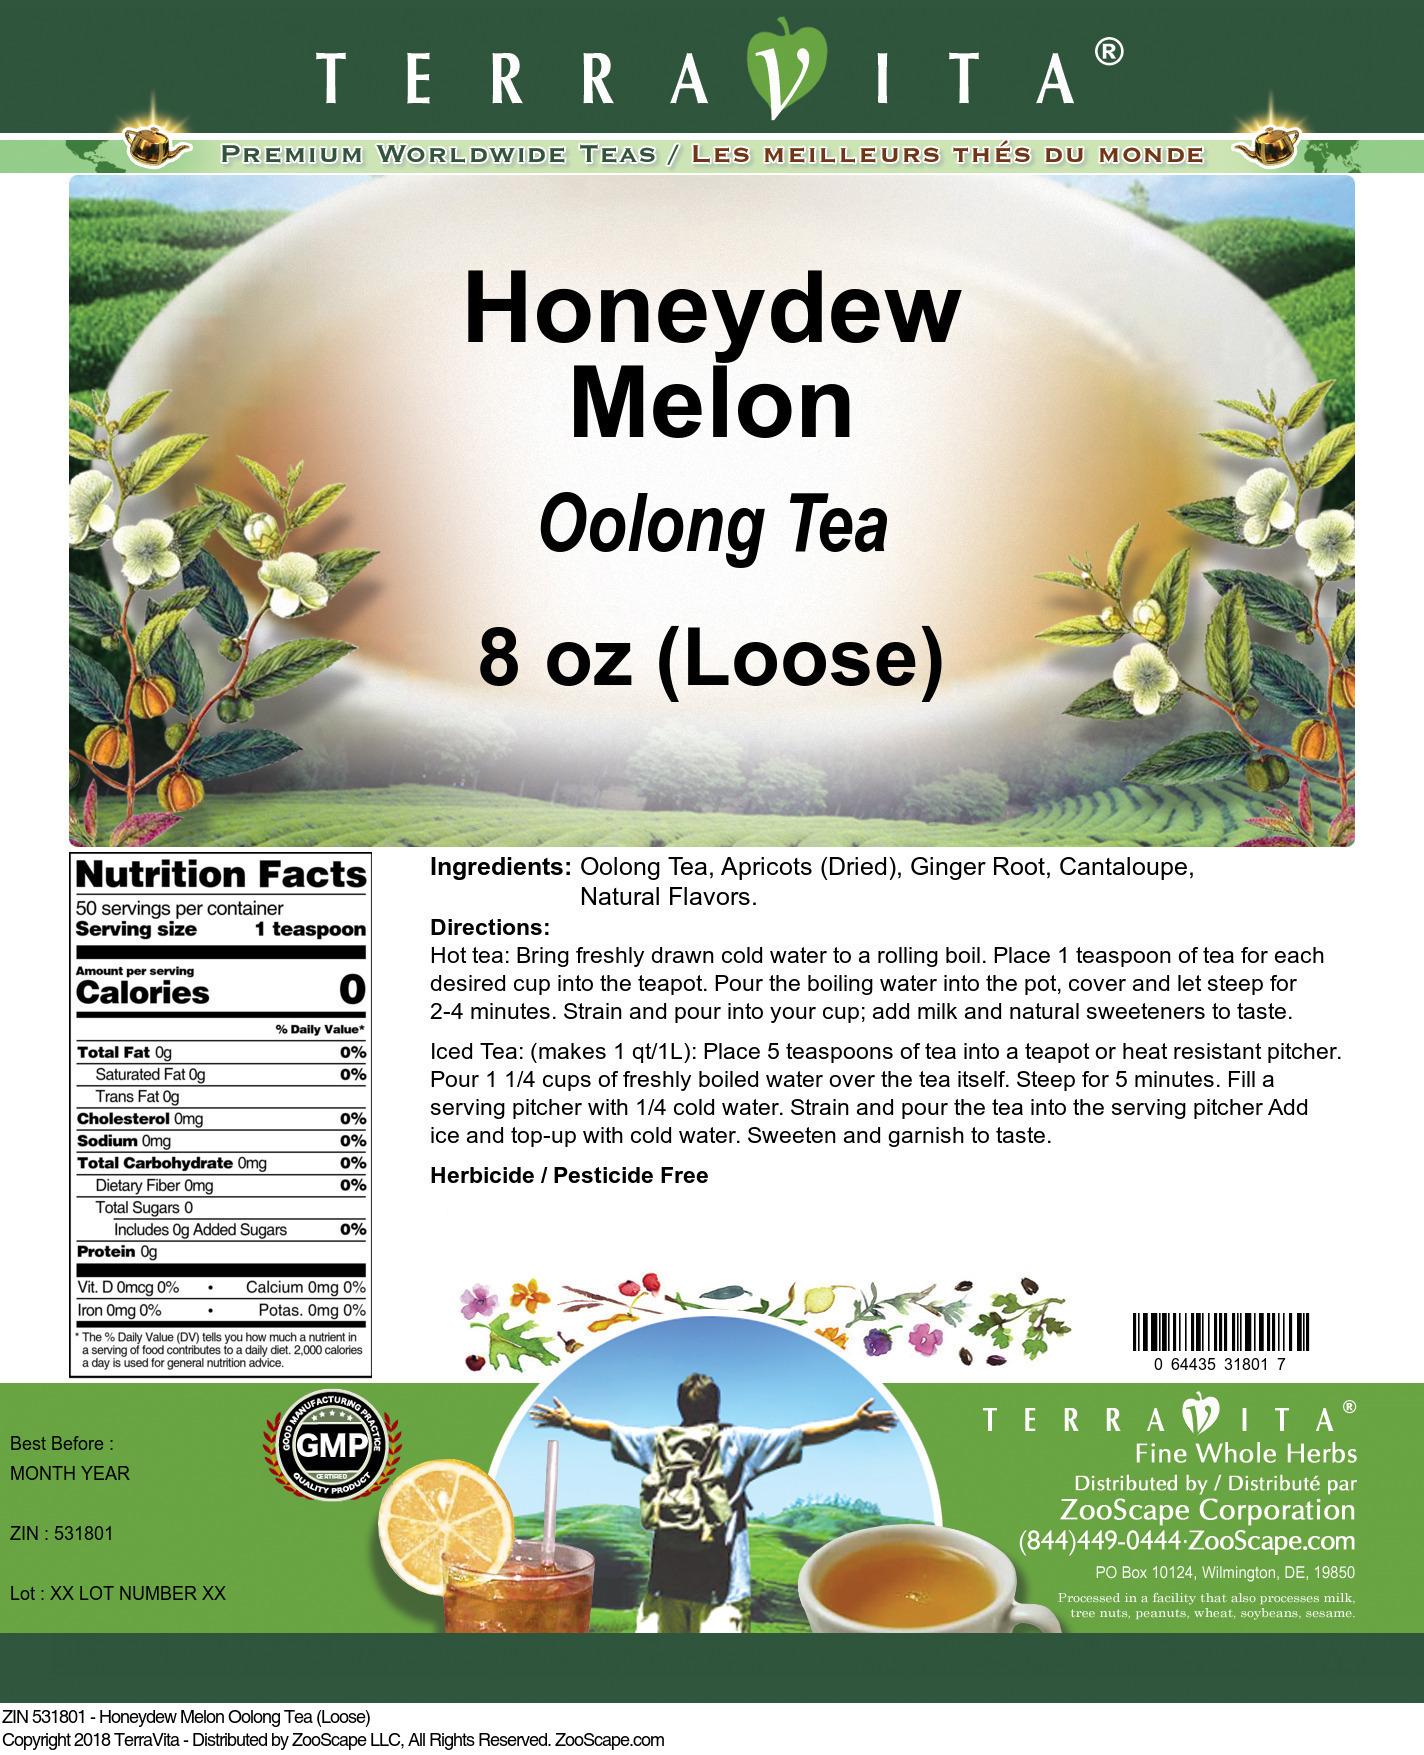 Honeydew Melon Oolong Tea